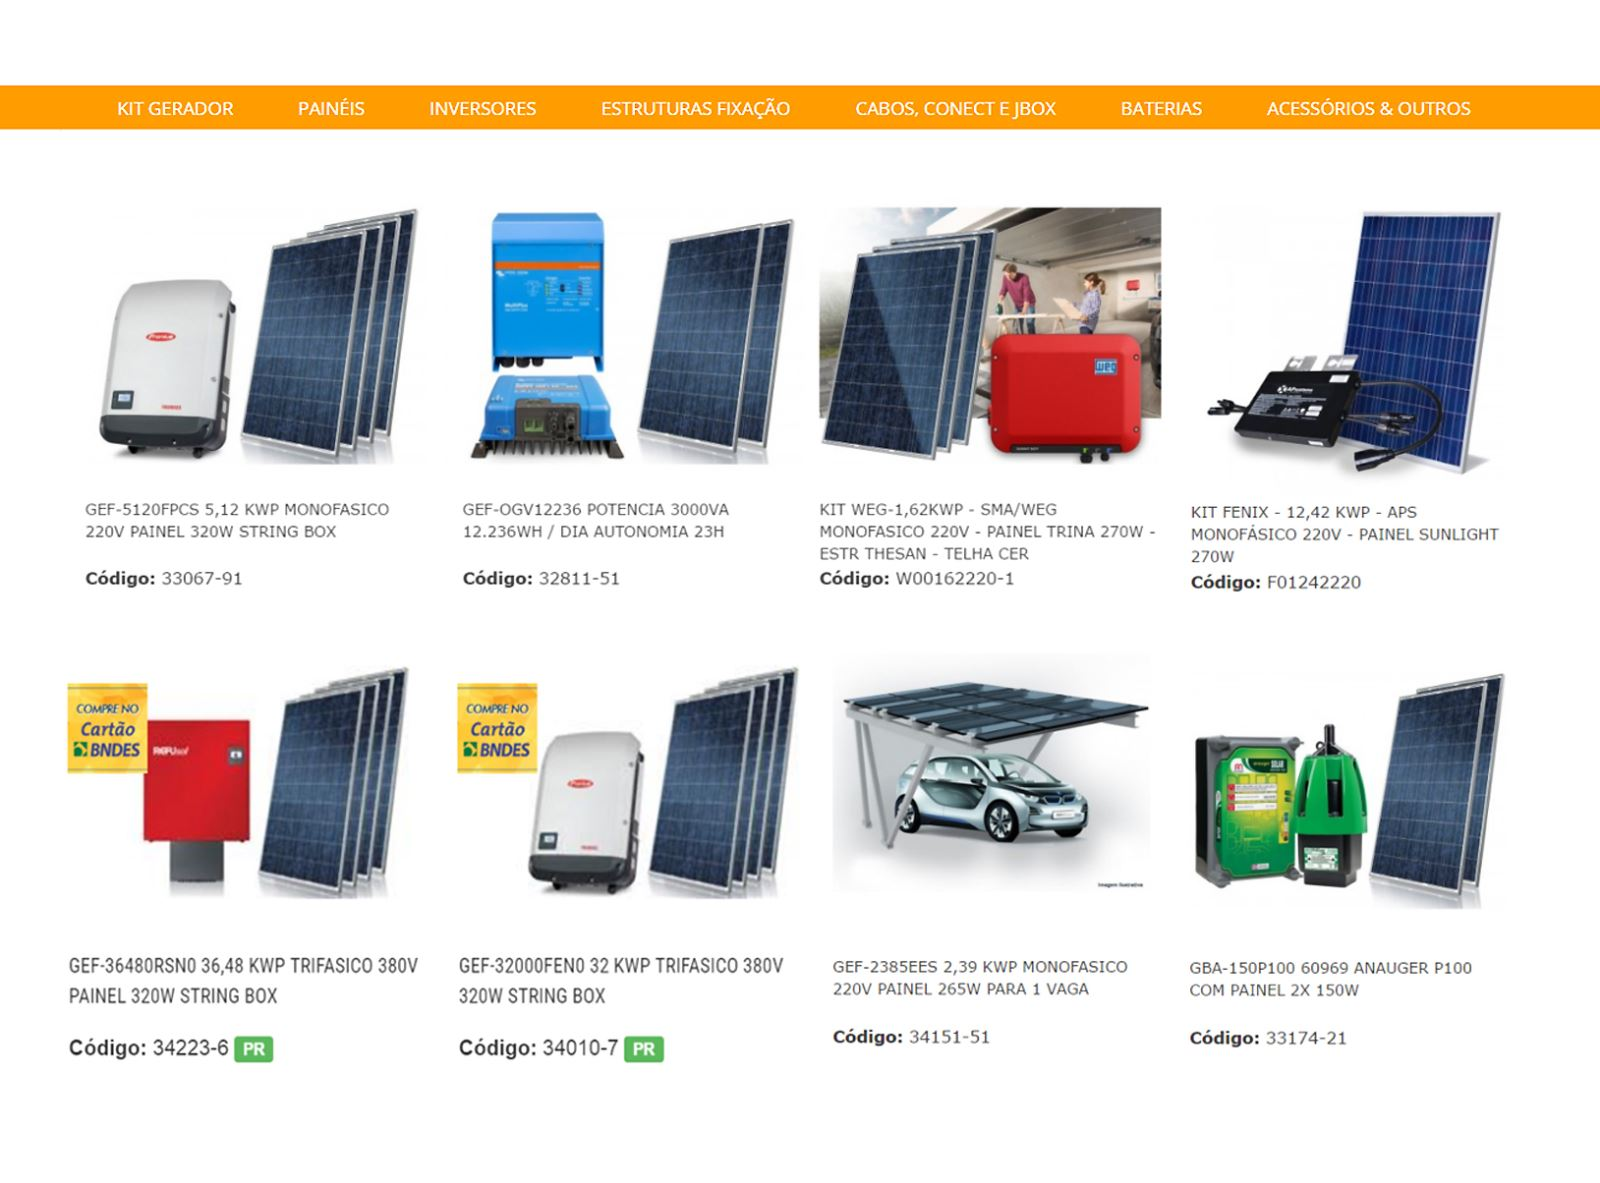 fornecedor equipamentos energia solar - Loja de Energia Solar